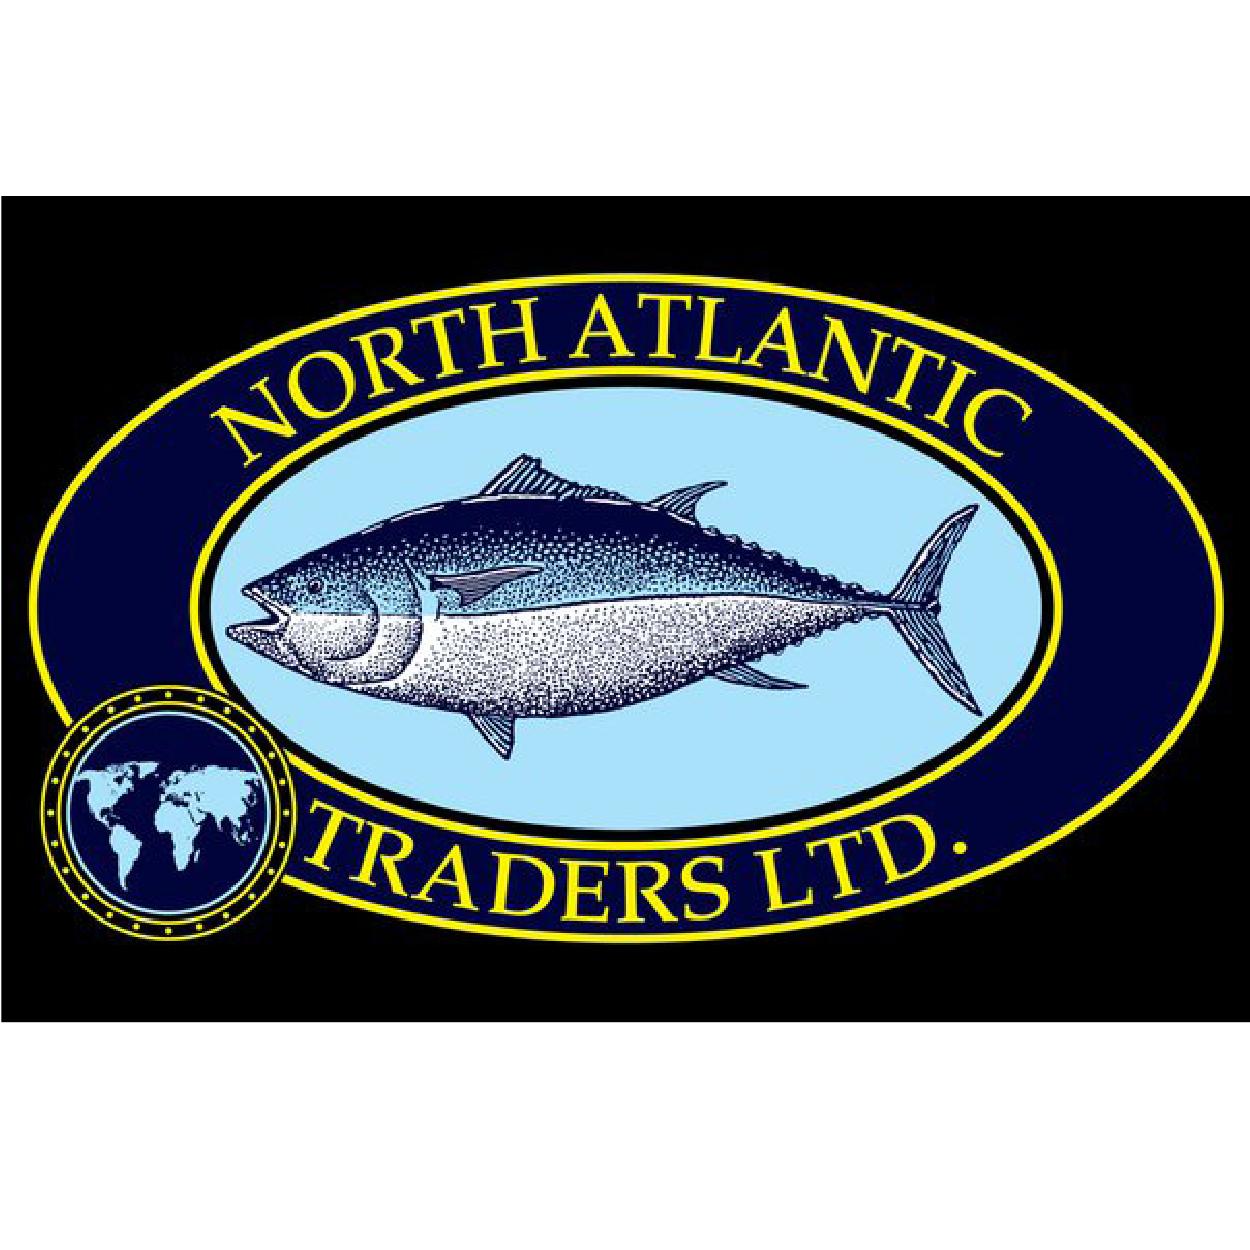 Dealers — American Bluefin Tuna Association